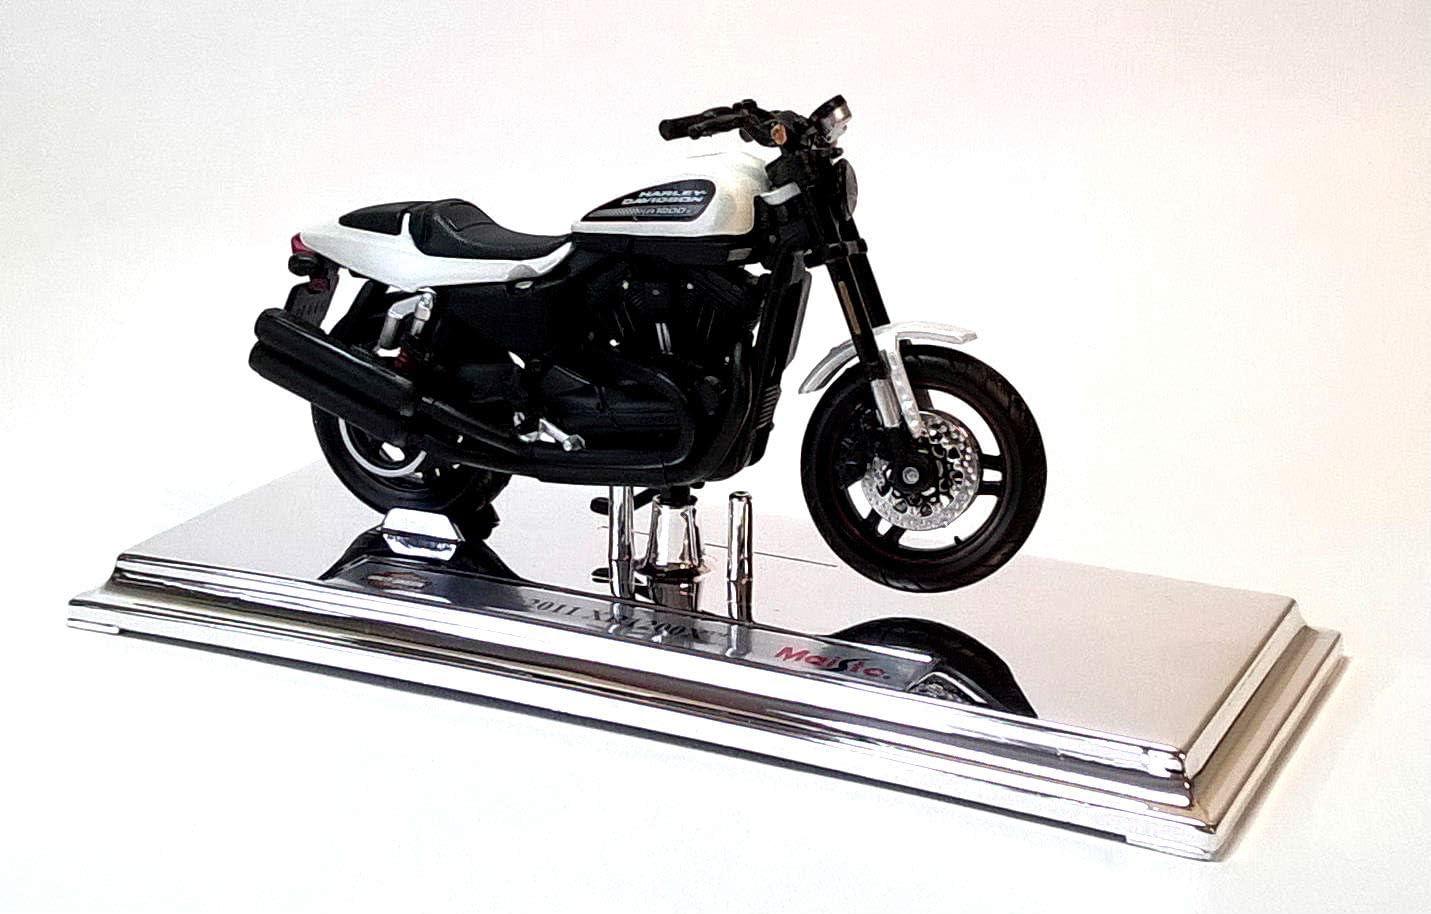 Fertigmodell mattschwarz 2011 Maisto 1:18 Harley Davidson XR1200X Modellauto